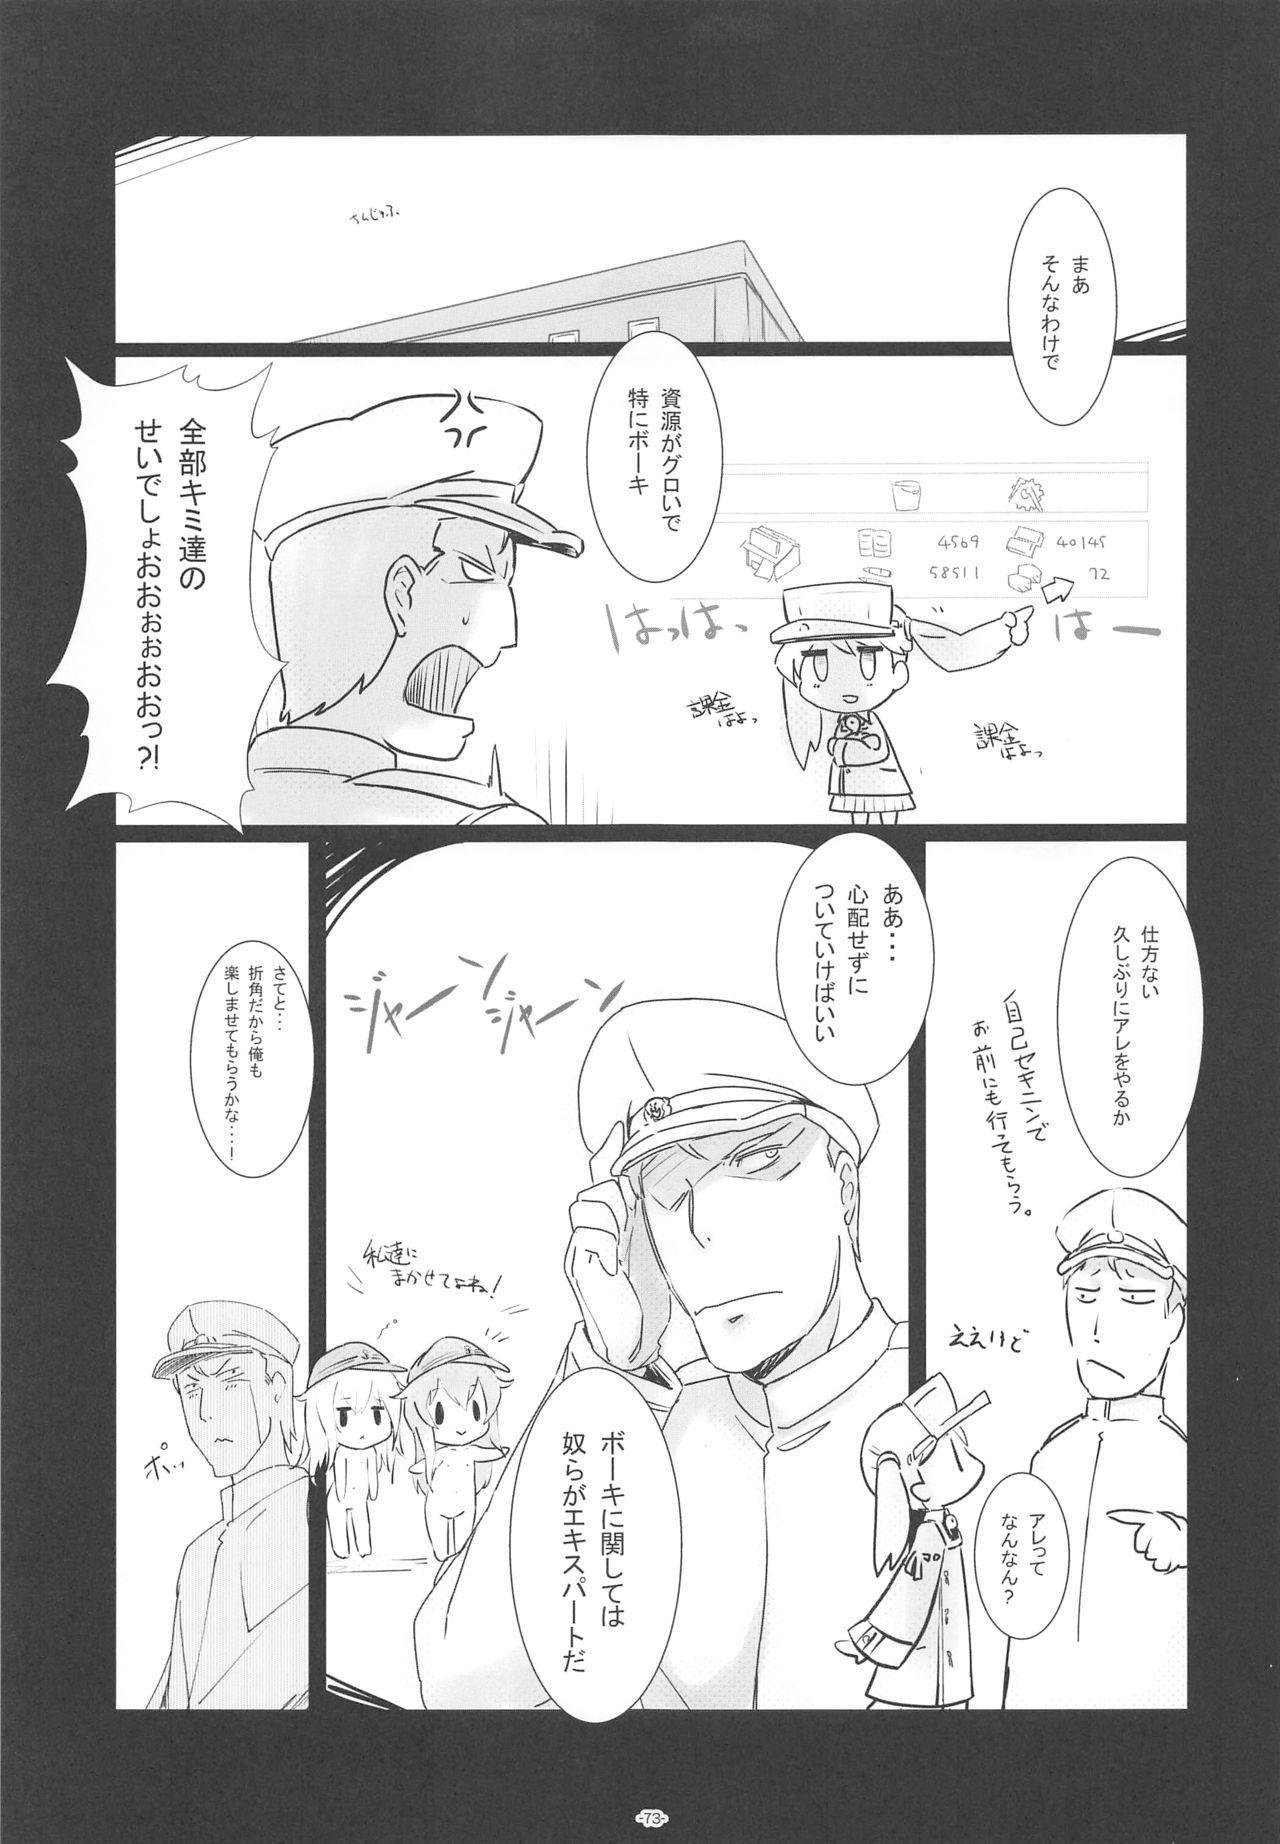 Korokoro-Manman II Korokoro:P Soushuuhen II 71